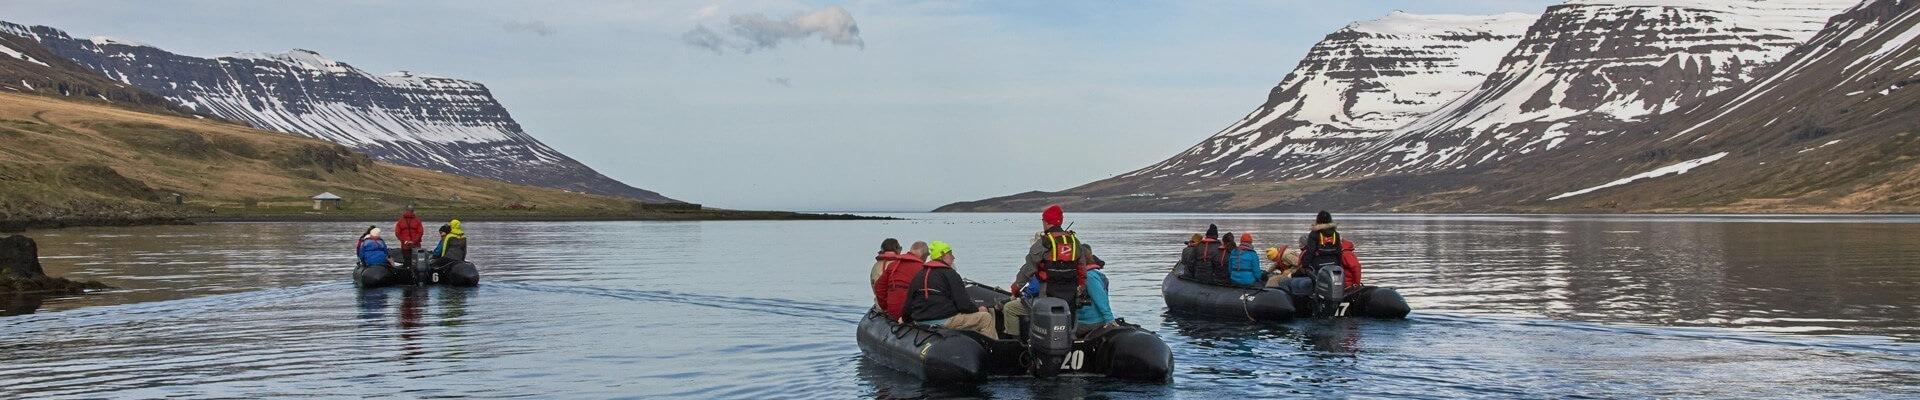 Greenland Adventure Cruises and Arctic Holidays